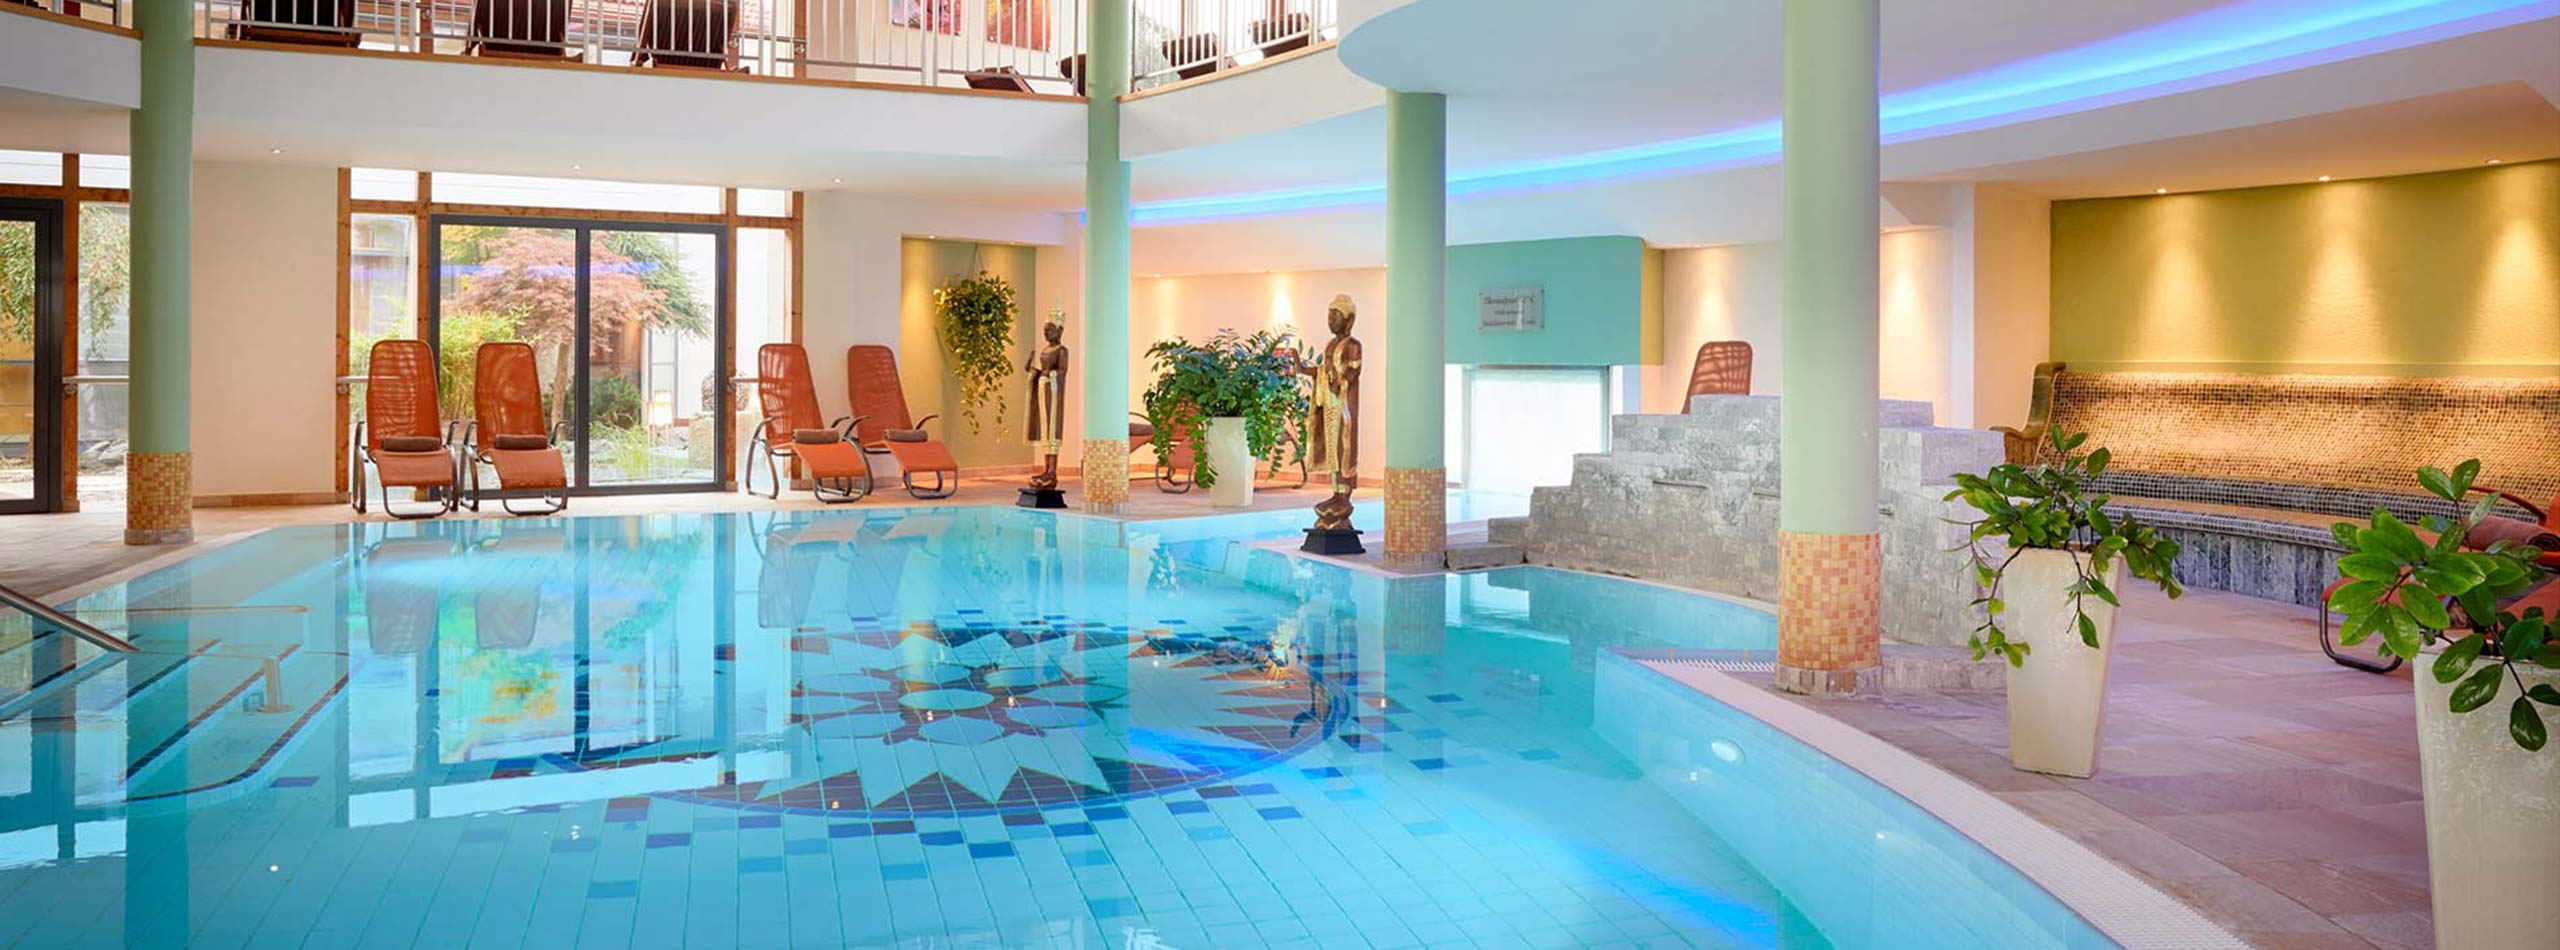 Thermal spa meets Ayurveda in Bad Waltersdorf, Styria